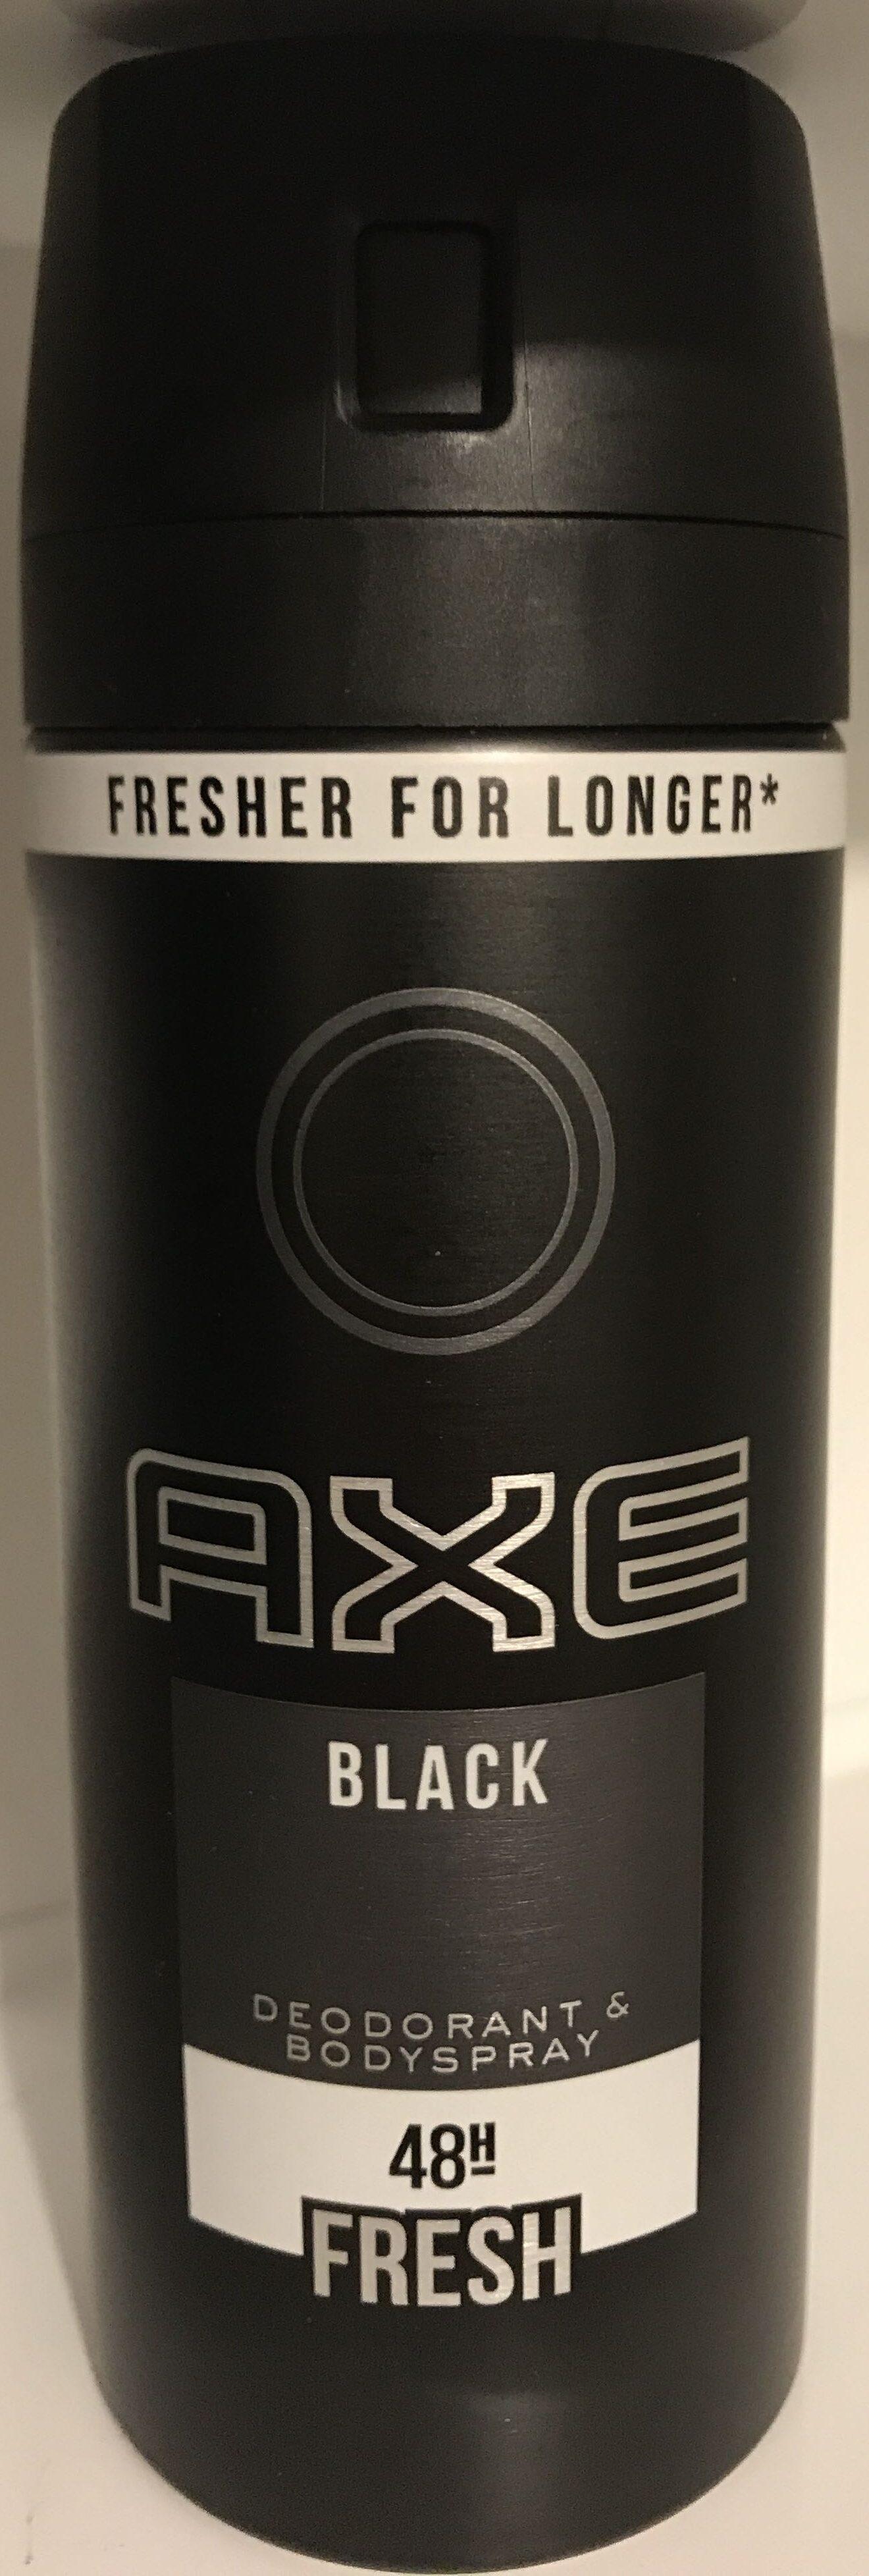 Axe Black - Product - en